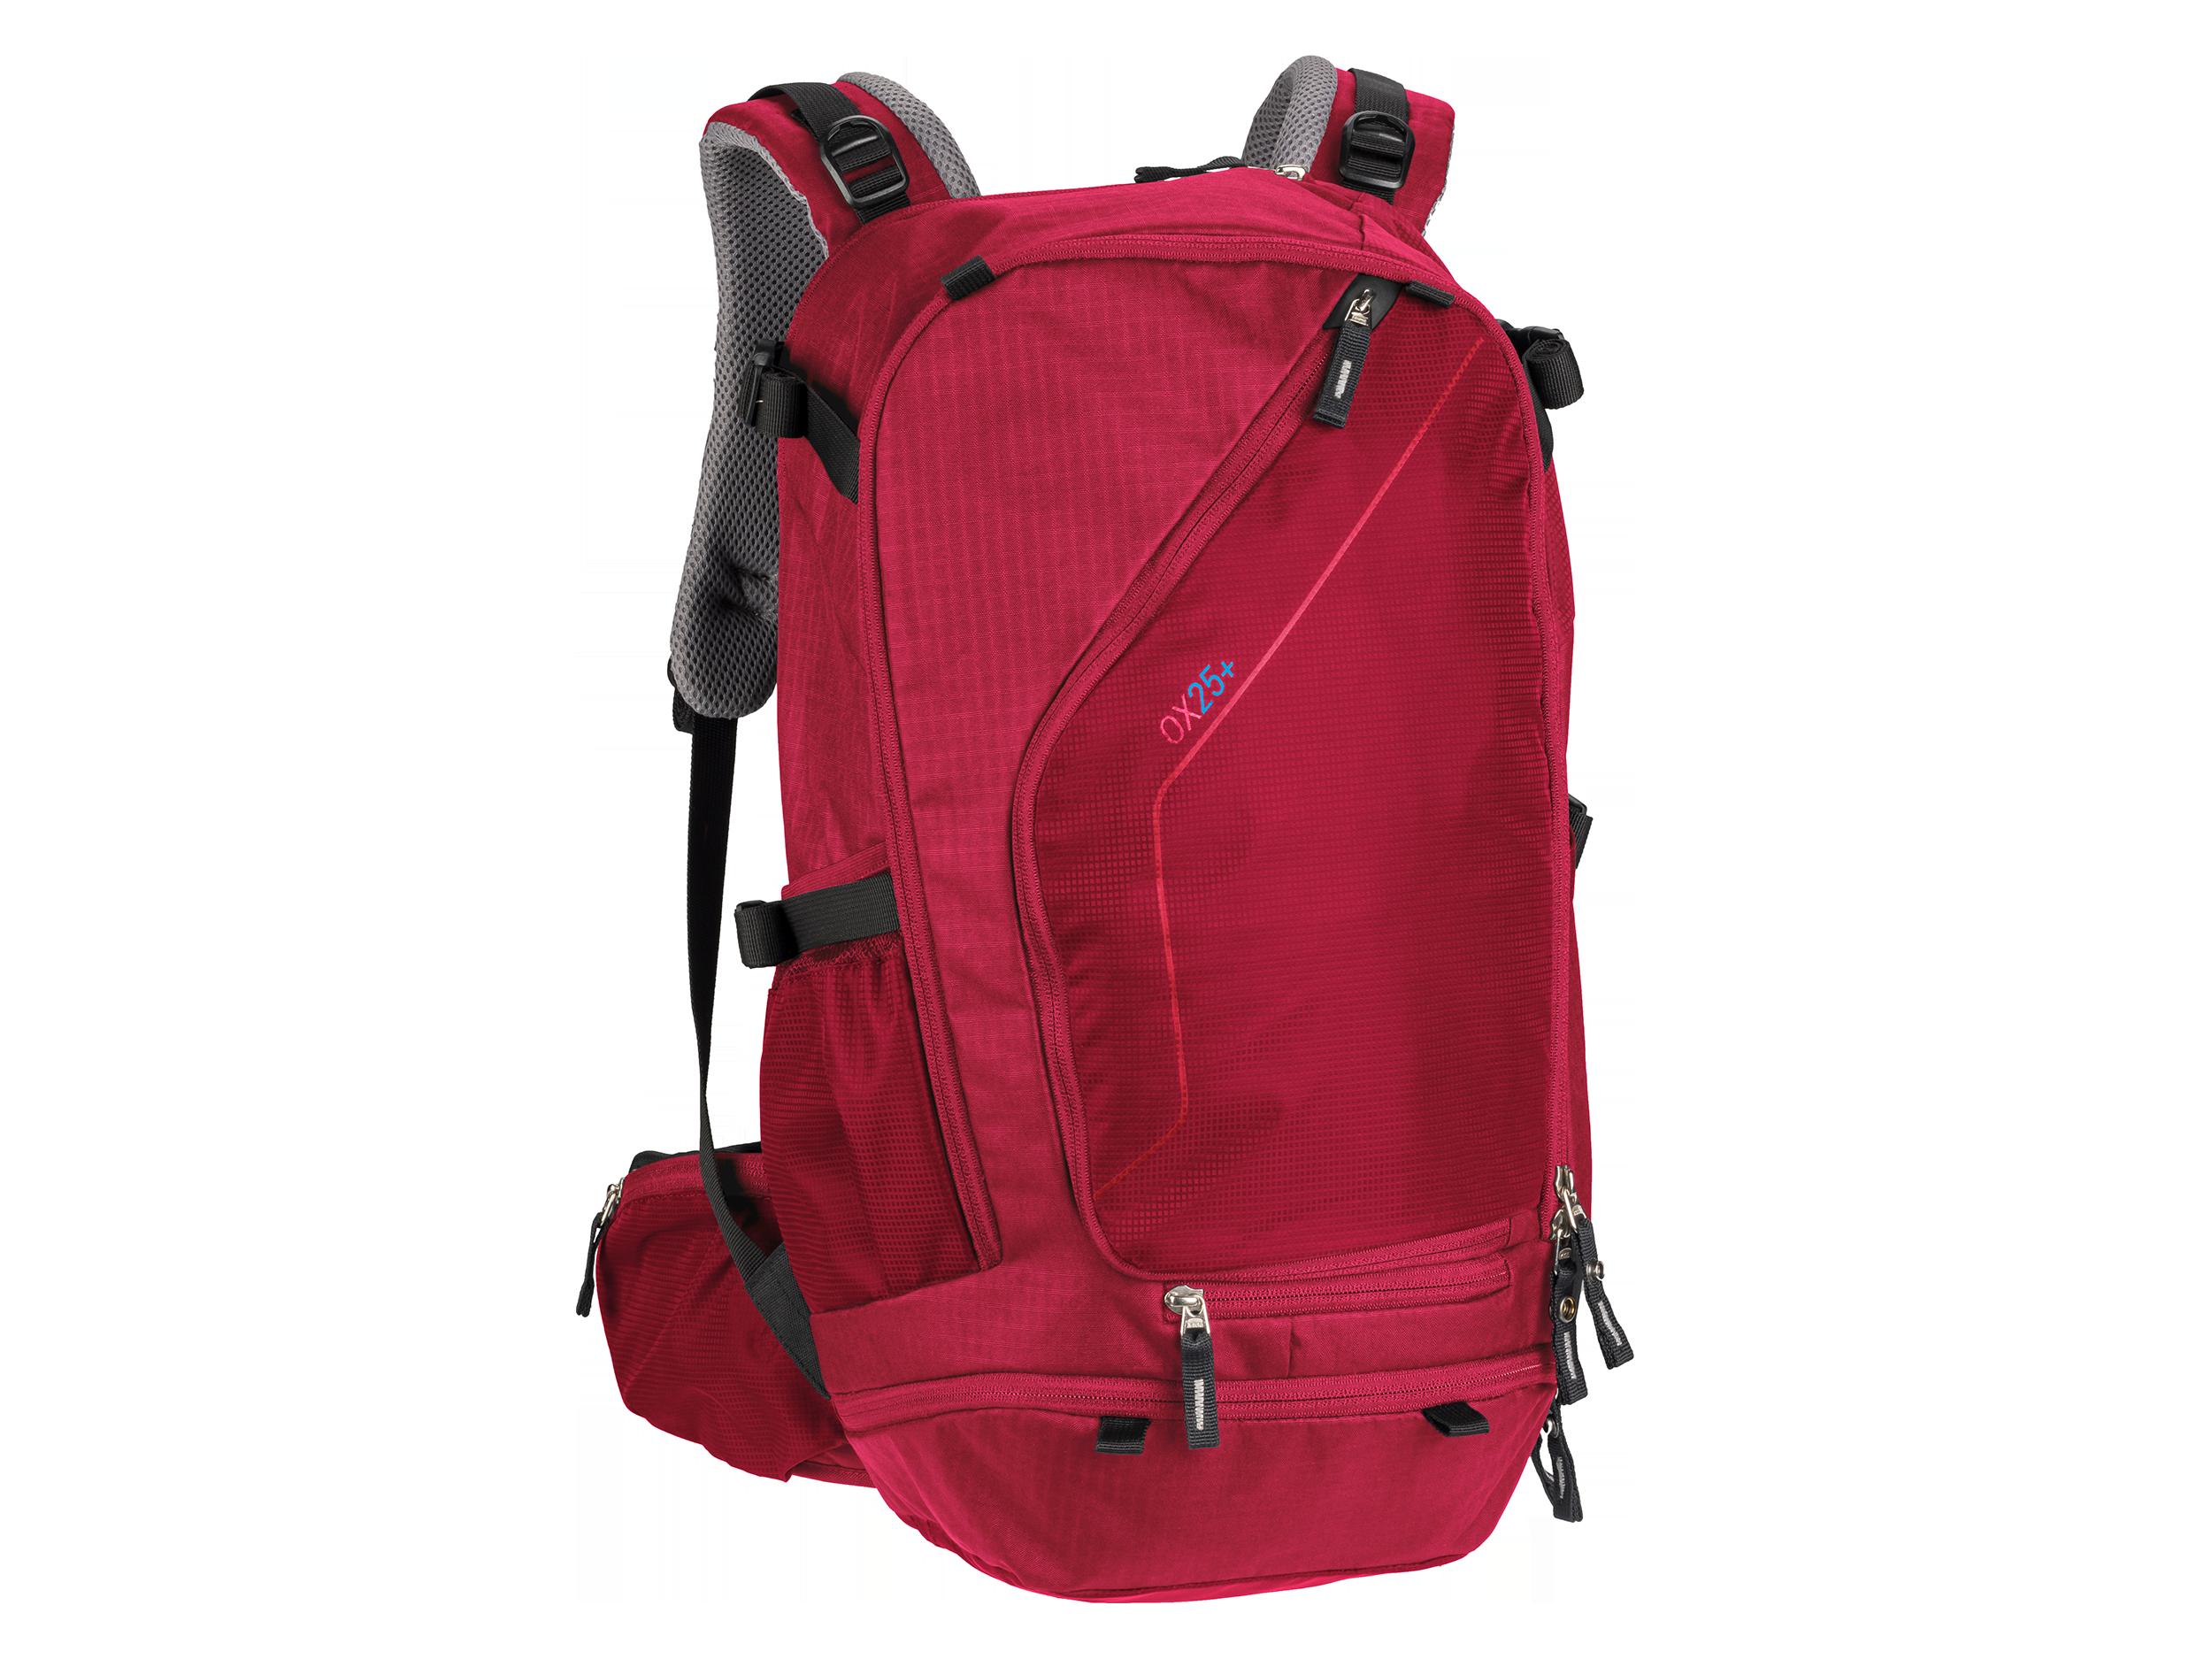 RUKSAK CUBE OX25+ RED 12105